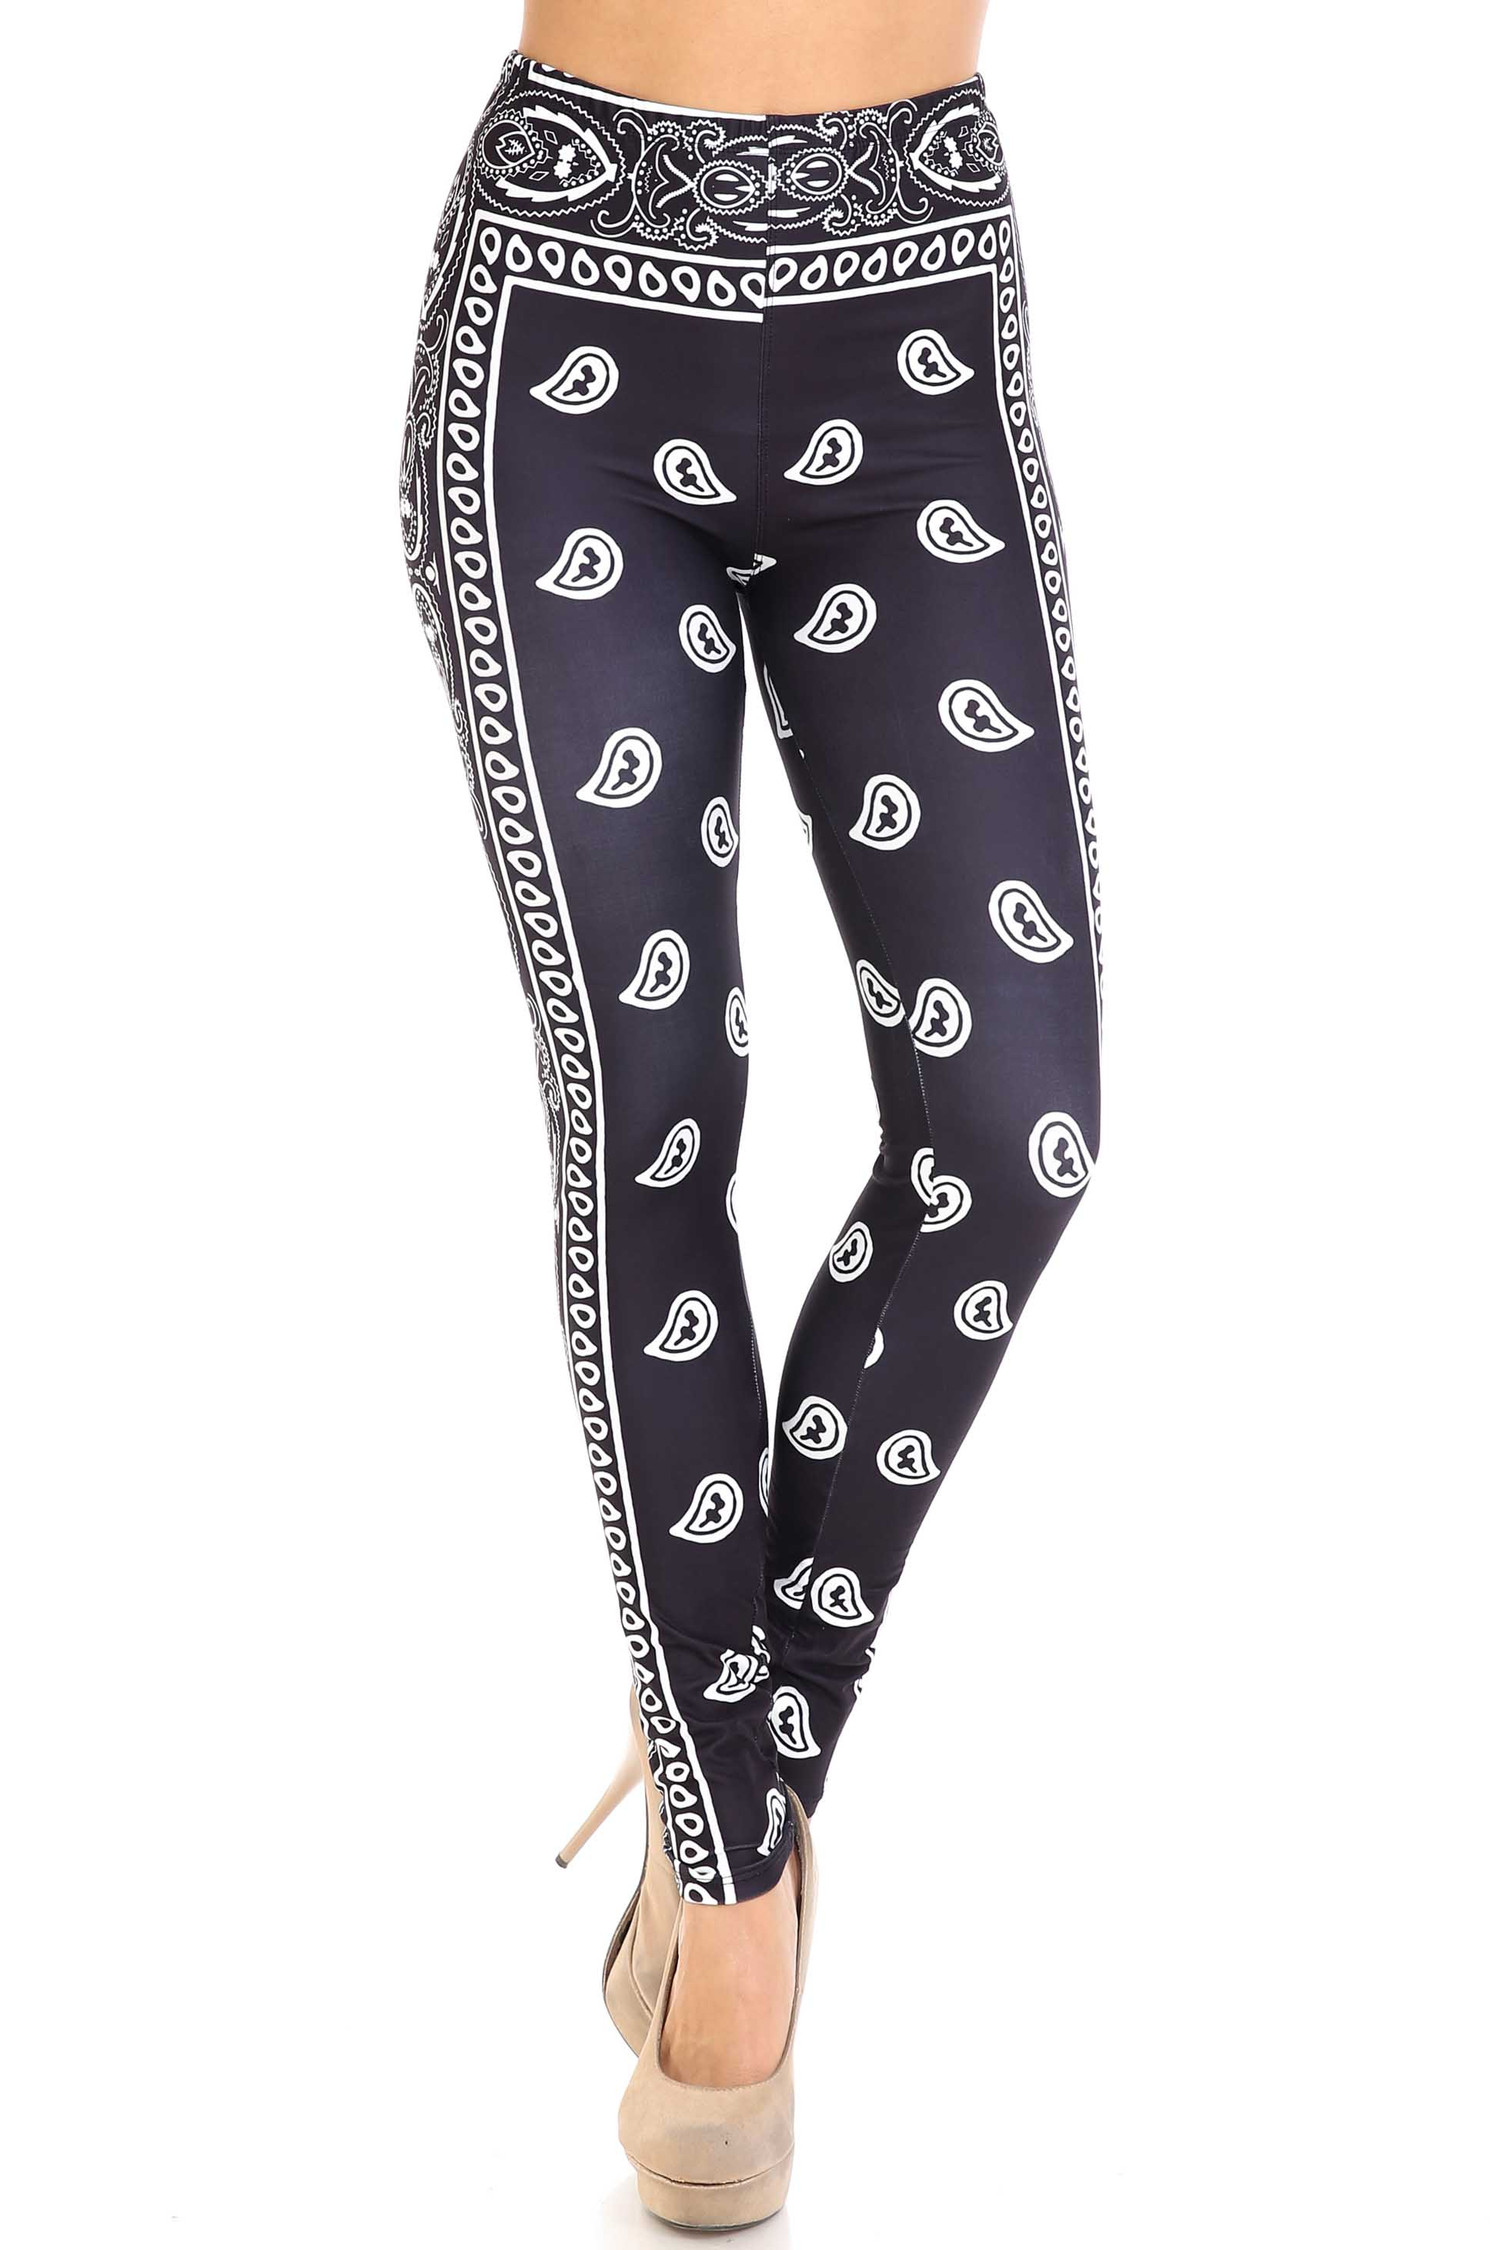 Creamy Soft Black Bandana Plus Size Leggings - USA Fashion™